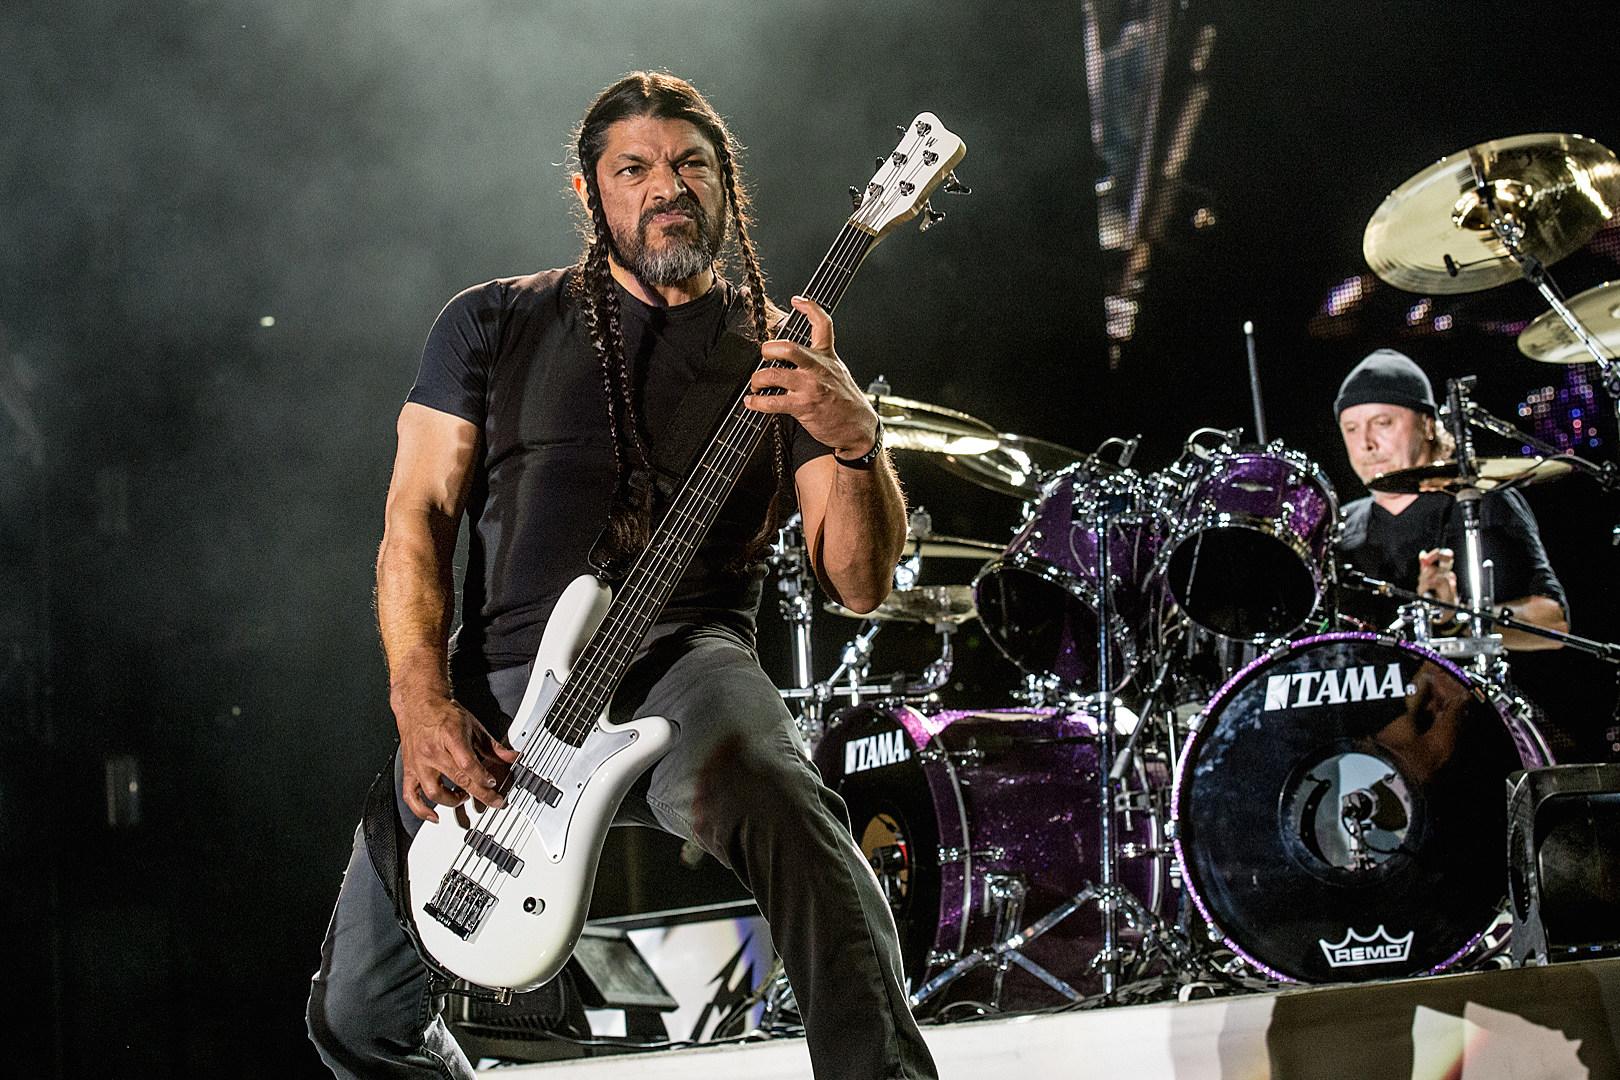 Robert Trujillo on Metallica